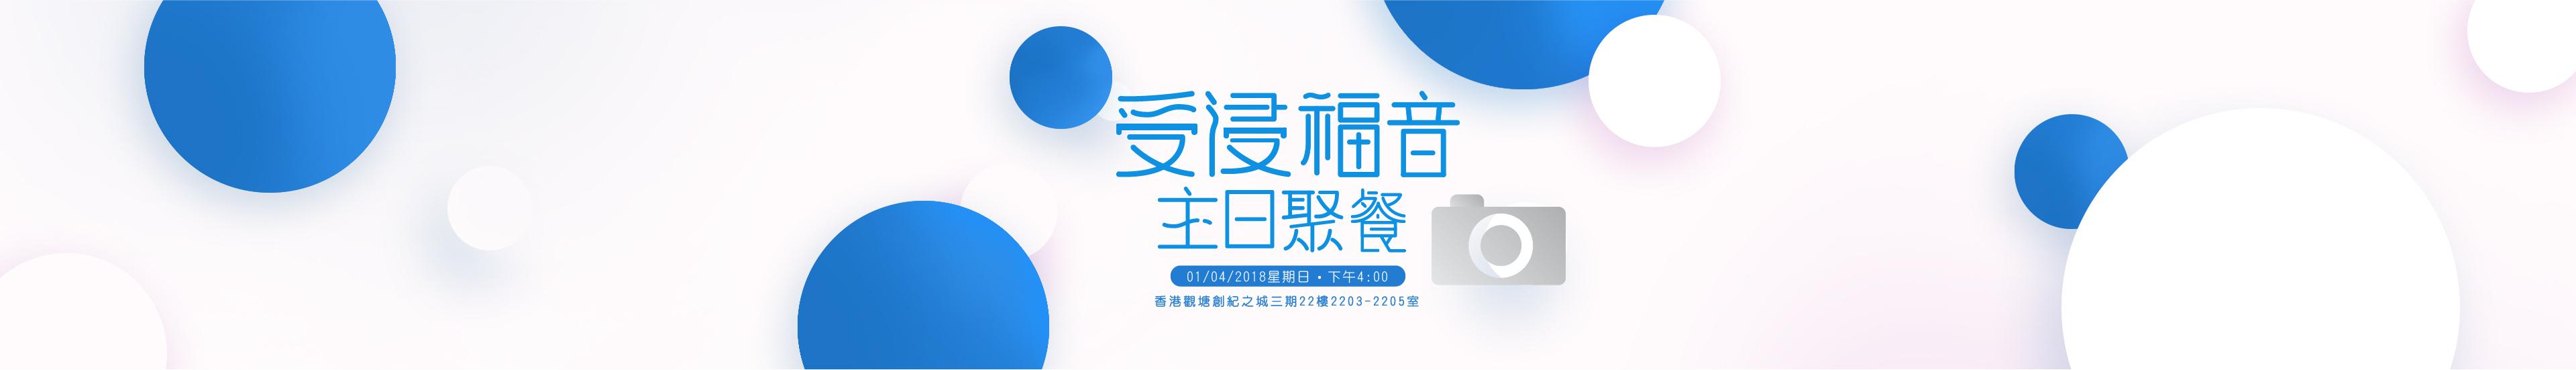 2018_season_1_受浸禮_website-02